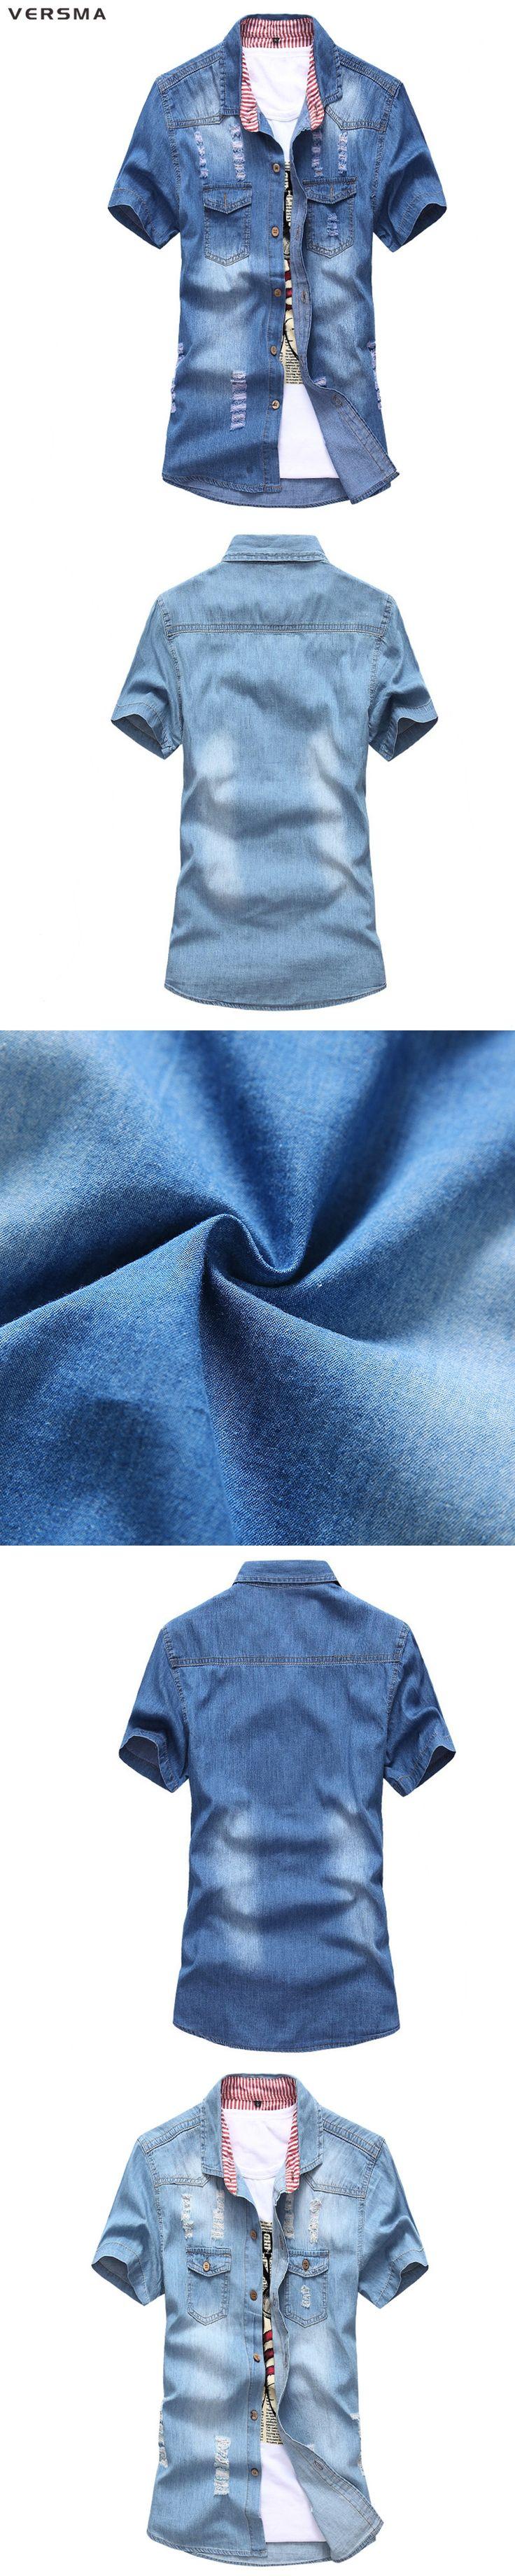 VERSMA 2017 Patchwork Short Sleeve Blue Cowboy Womens Mens Distressed Denim Shirt Men Slim Fit Ripped Cotton Denim Jeans Shirt